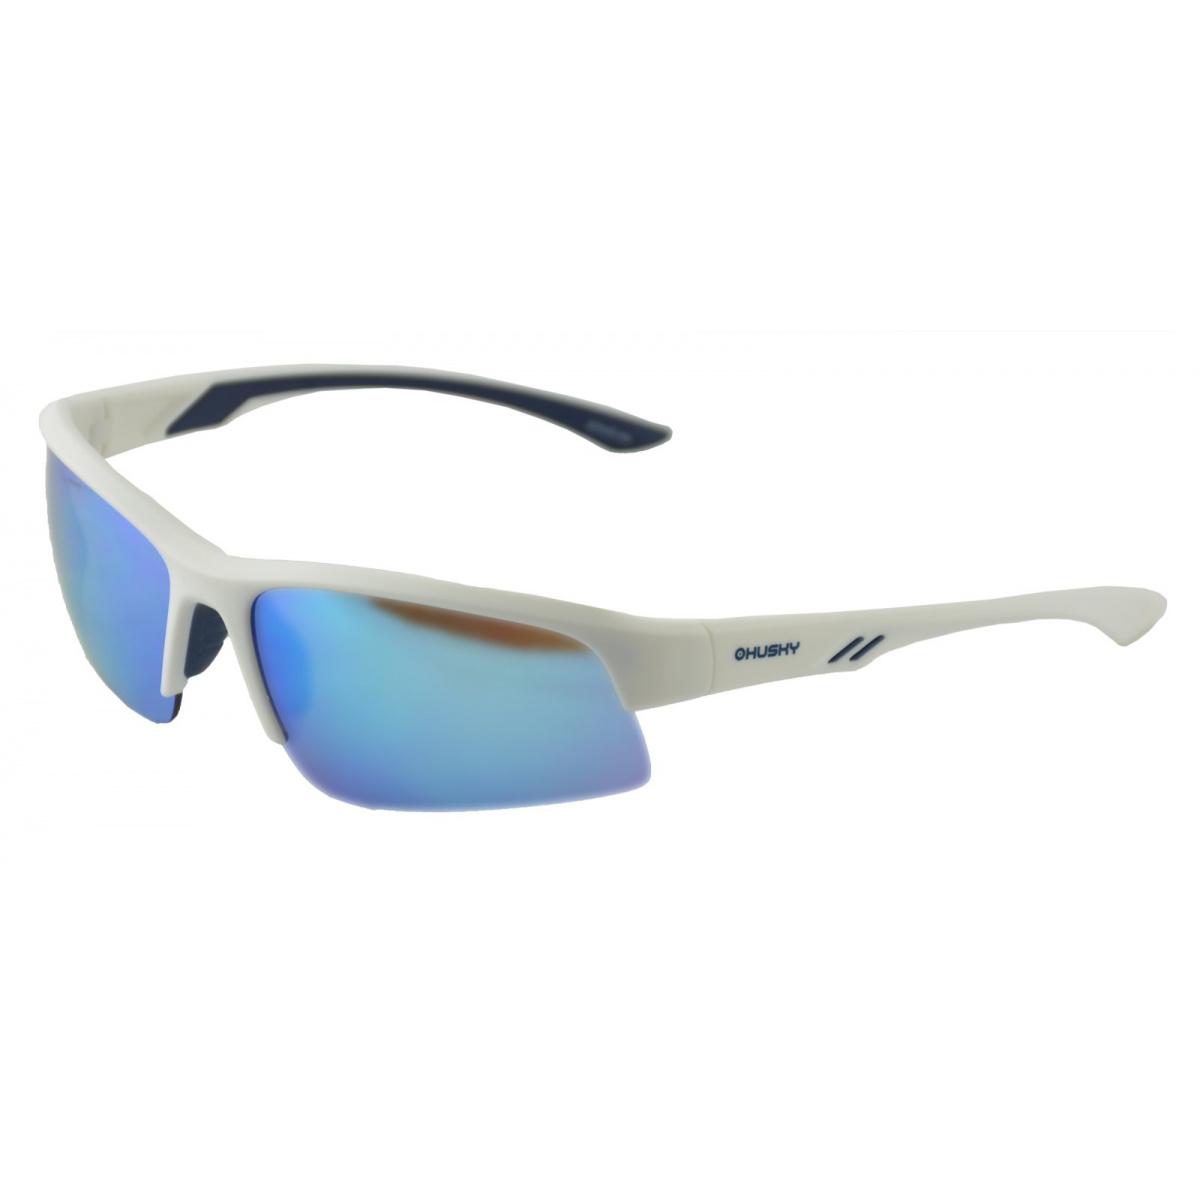 9804b246bd331 Športové okuliare - Stave – biela | HUSKY | e-shop výrobcu